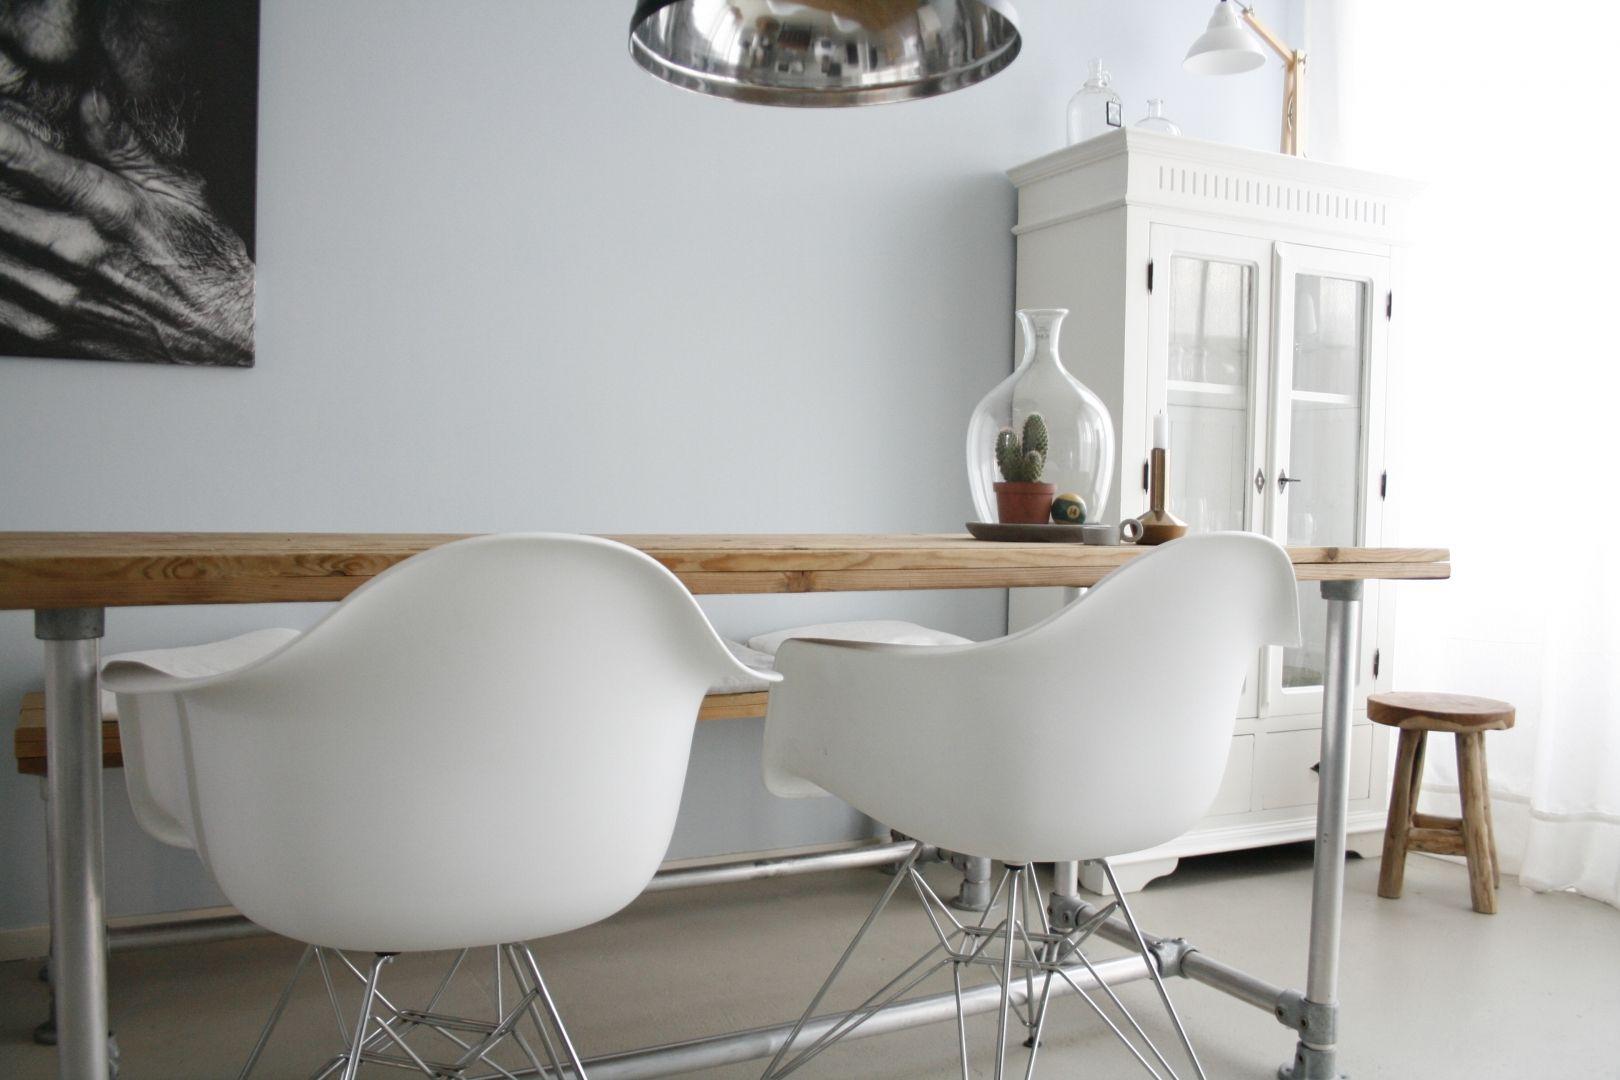 Binnenkijken Thuis Femke : Binnenkijken thuis lifestyle en interieur